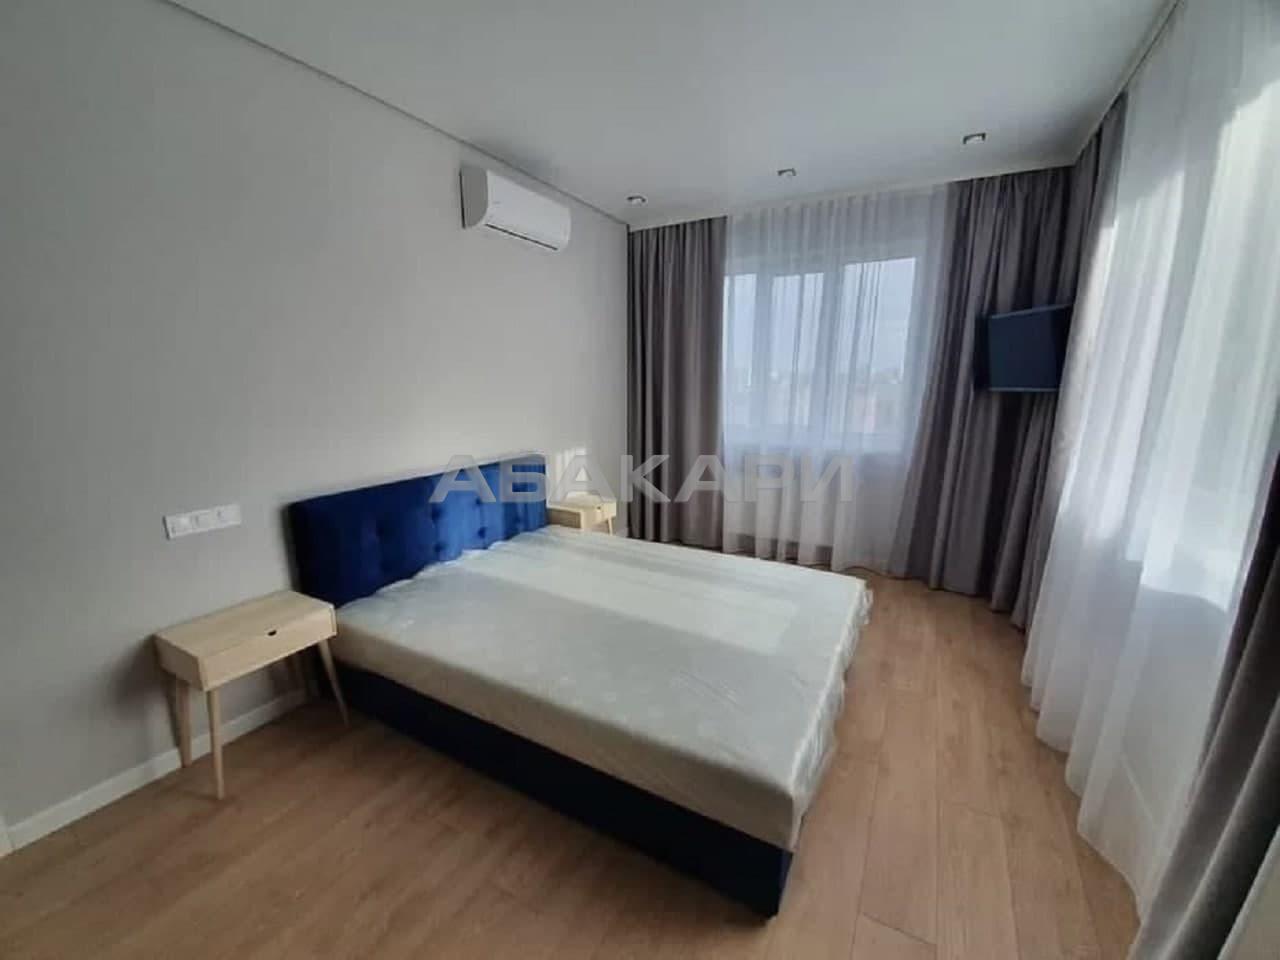 1к квартира Новосибирская улица, 1 11/17 - 36кв | 13500 | аренда в Красноярске фото 1